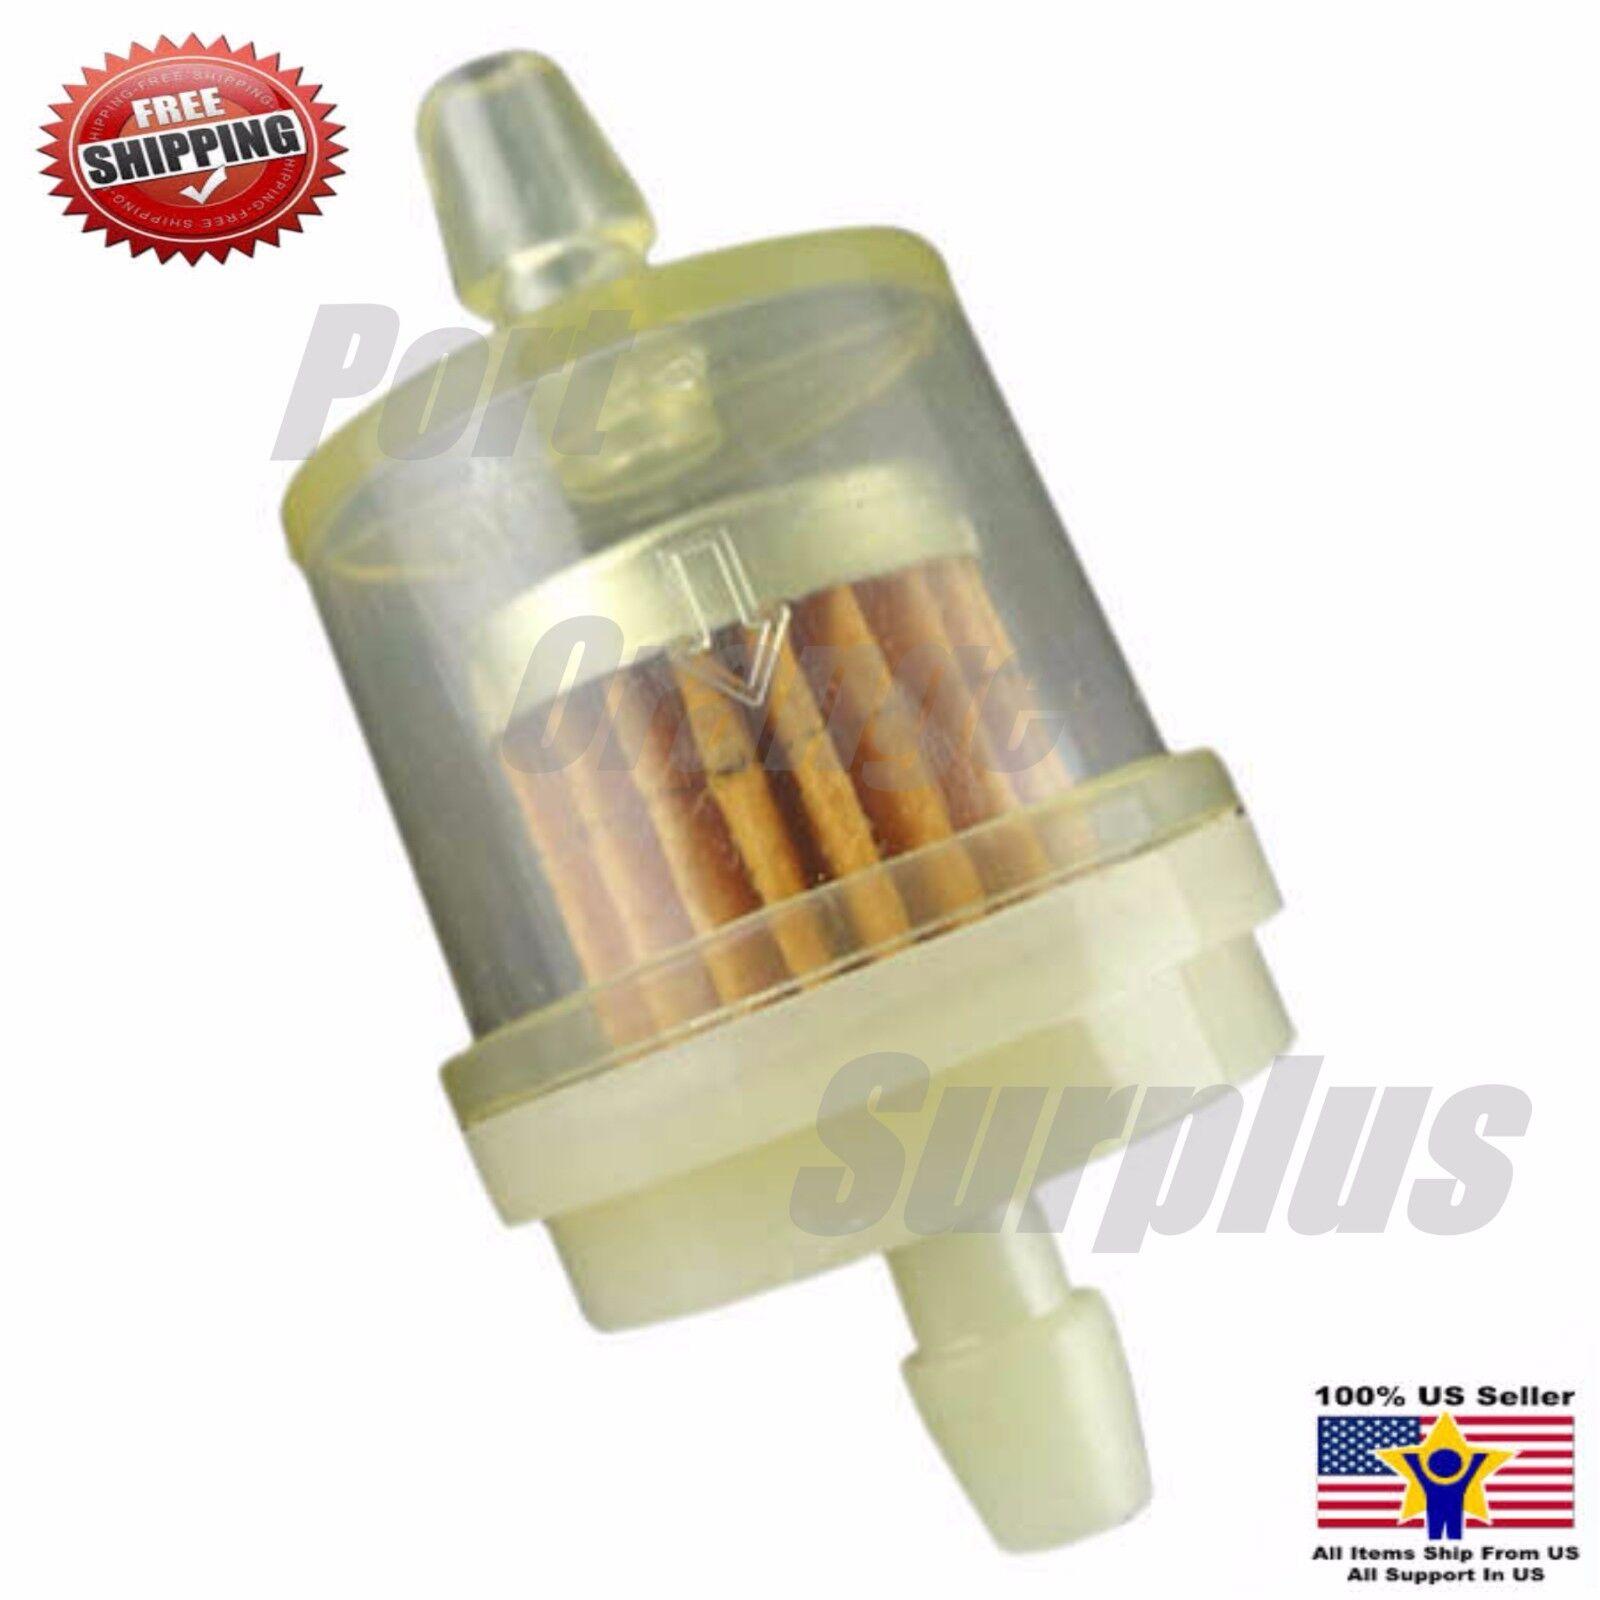 "10Pcs 1//4/"" Fuel Filters fit 4 Strokes 50cc 70cc 110cc 125cc 150cc Pit Dirt Bike"